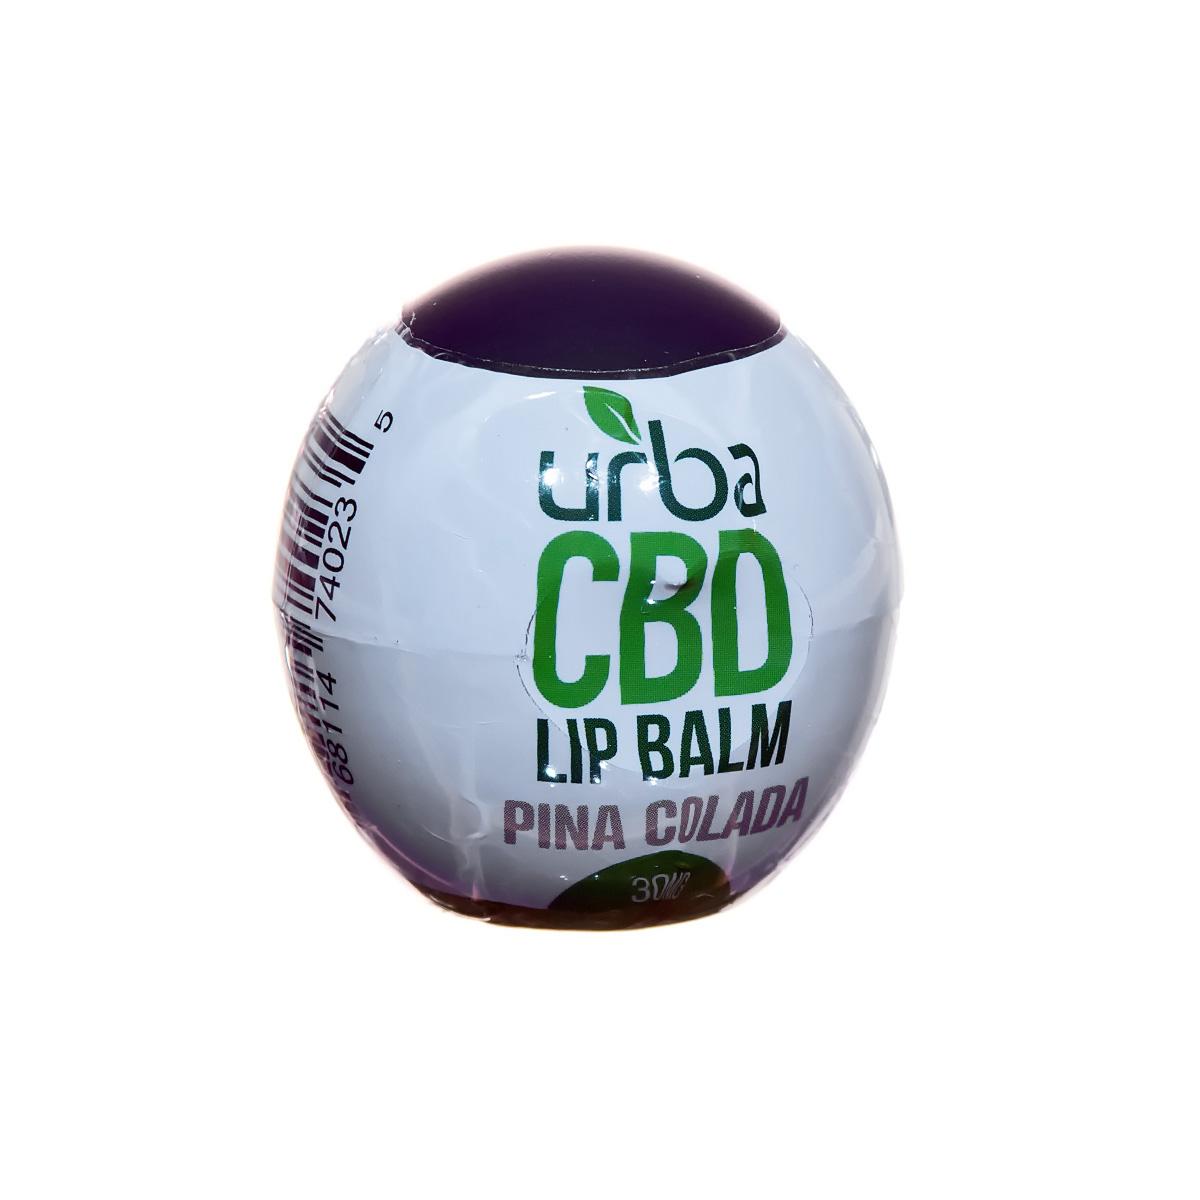 Urba CBD Lip Balm Pina Colada